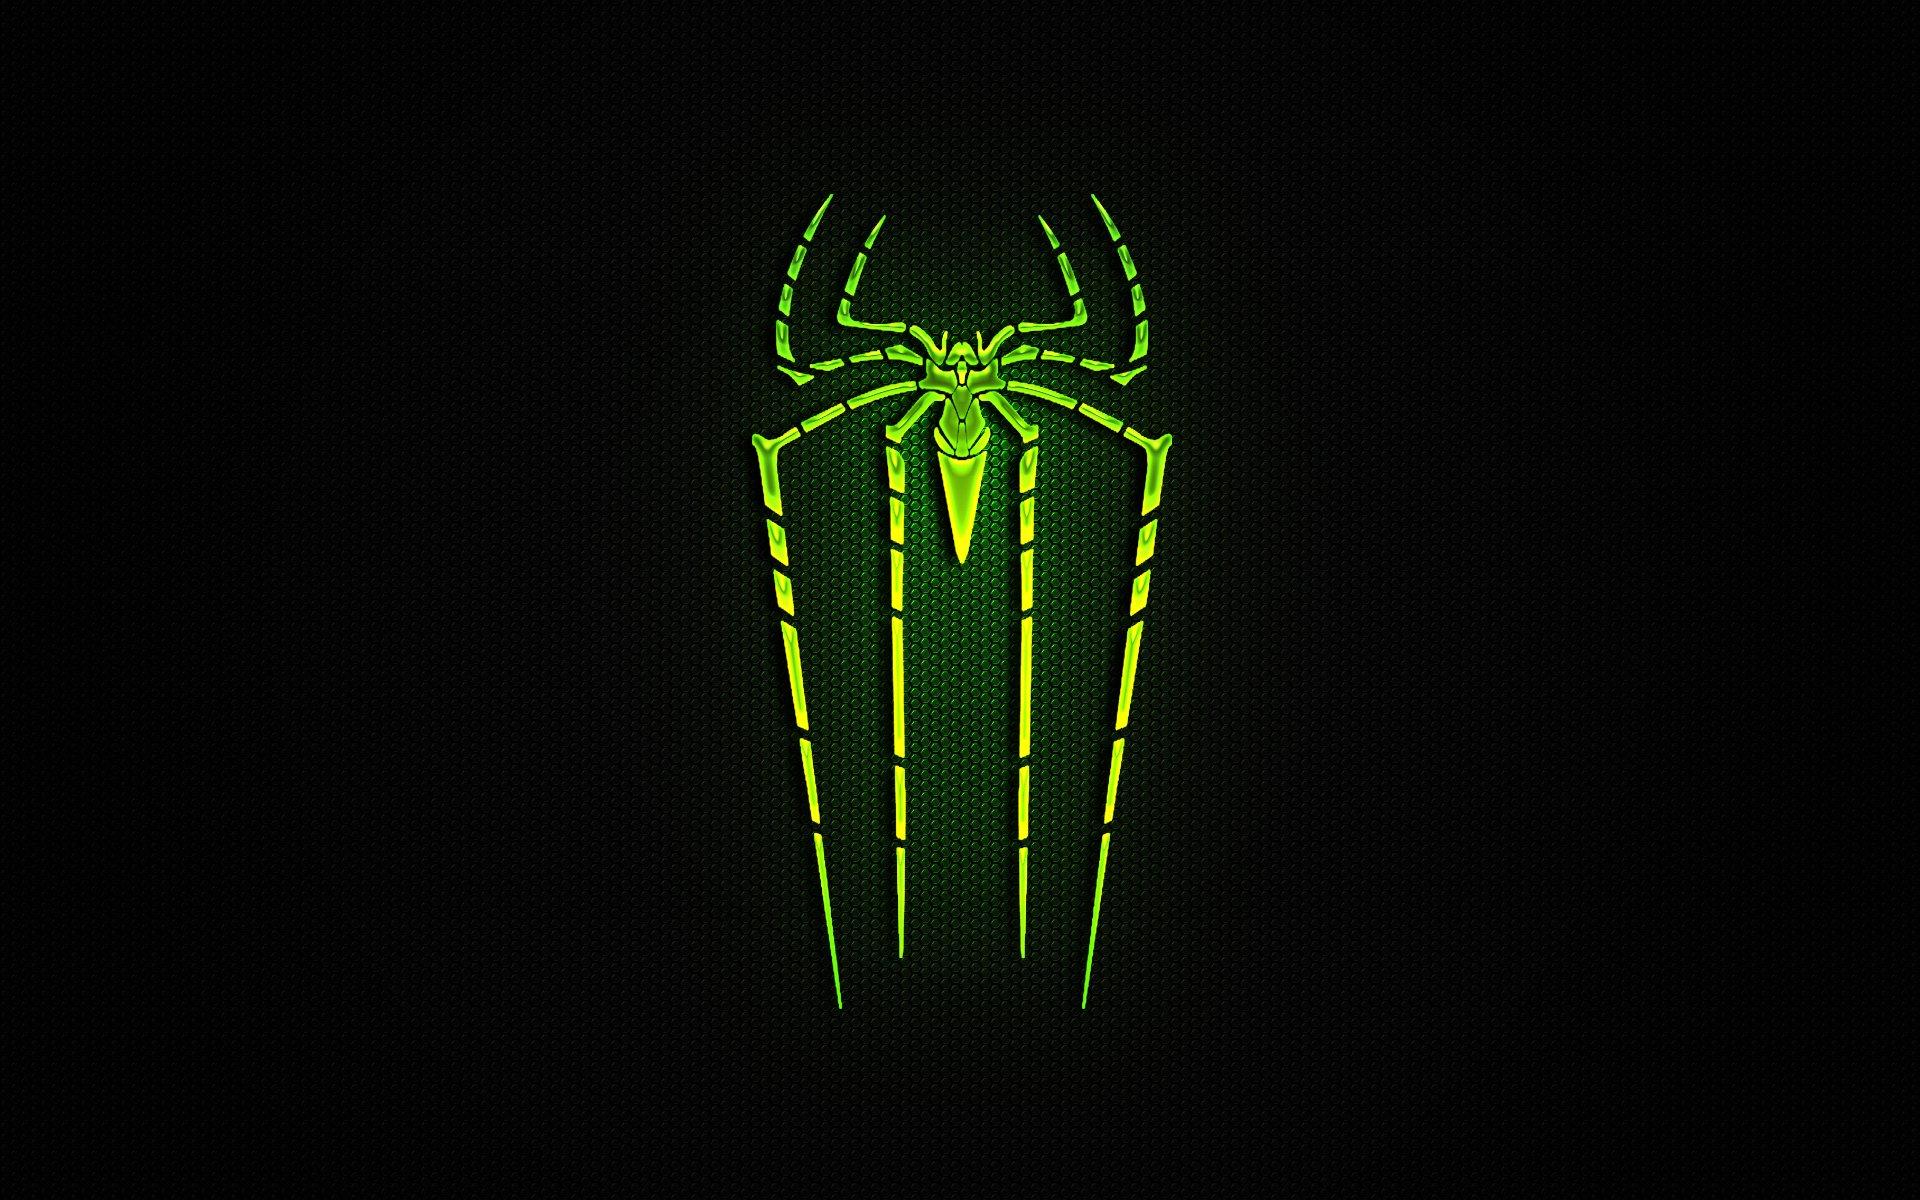 Monster Energy Iphone Wallpaper Http Onexproof Deviantart Com Art The Amazing Spider Man